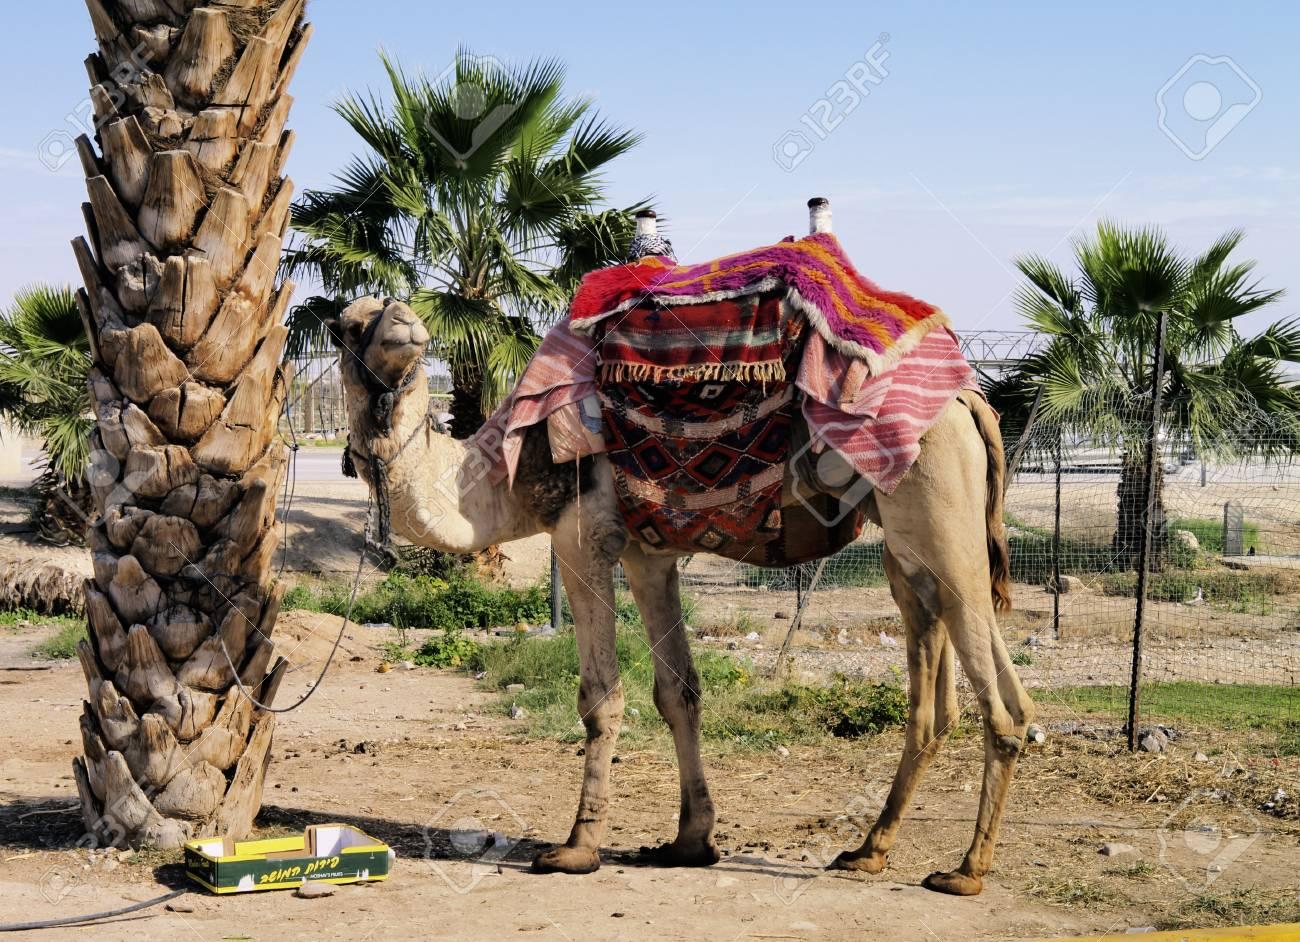 Camel, Israel Stock Photo - 14941159